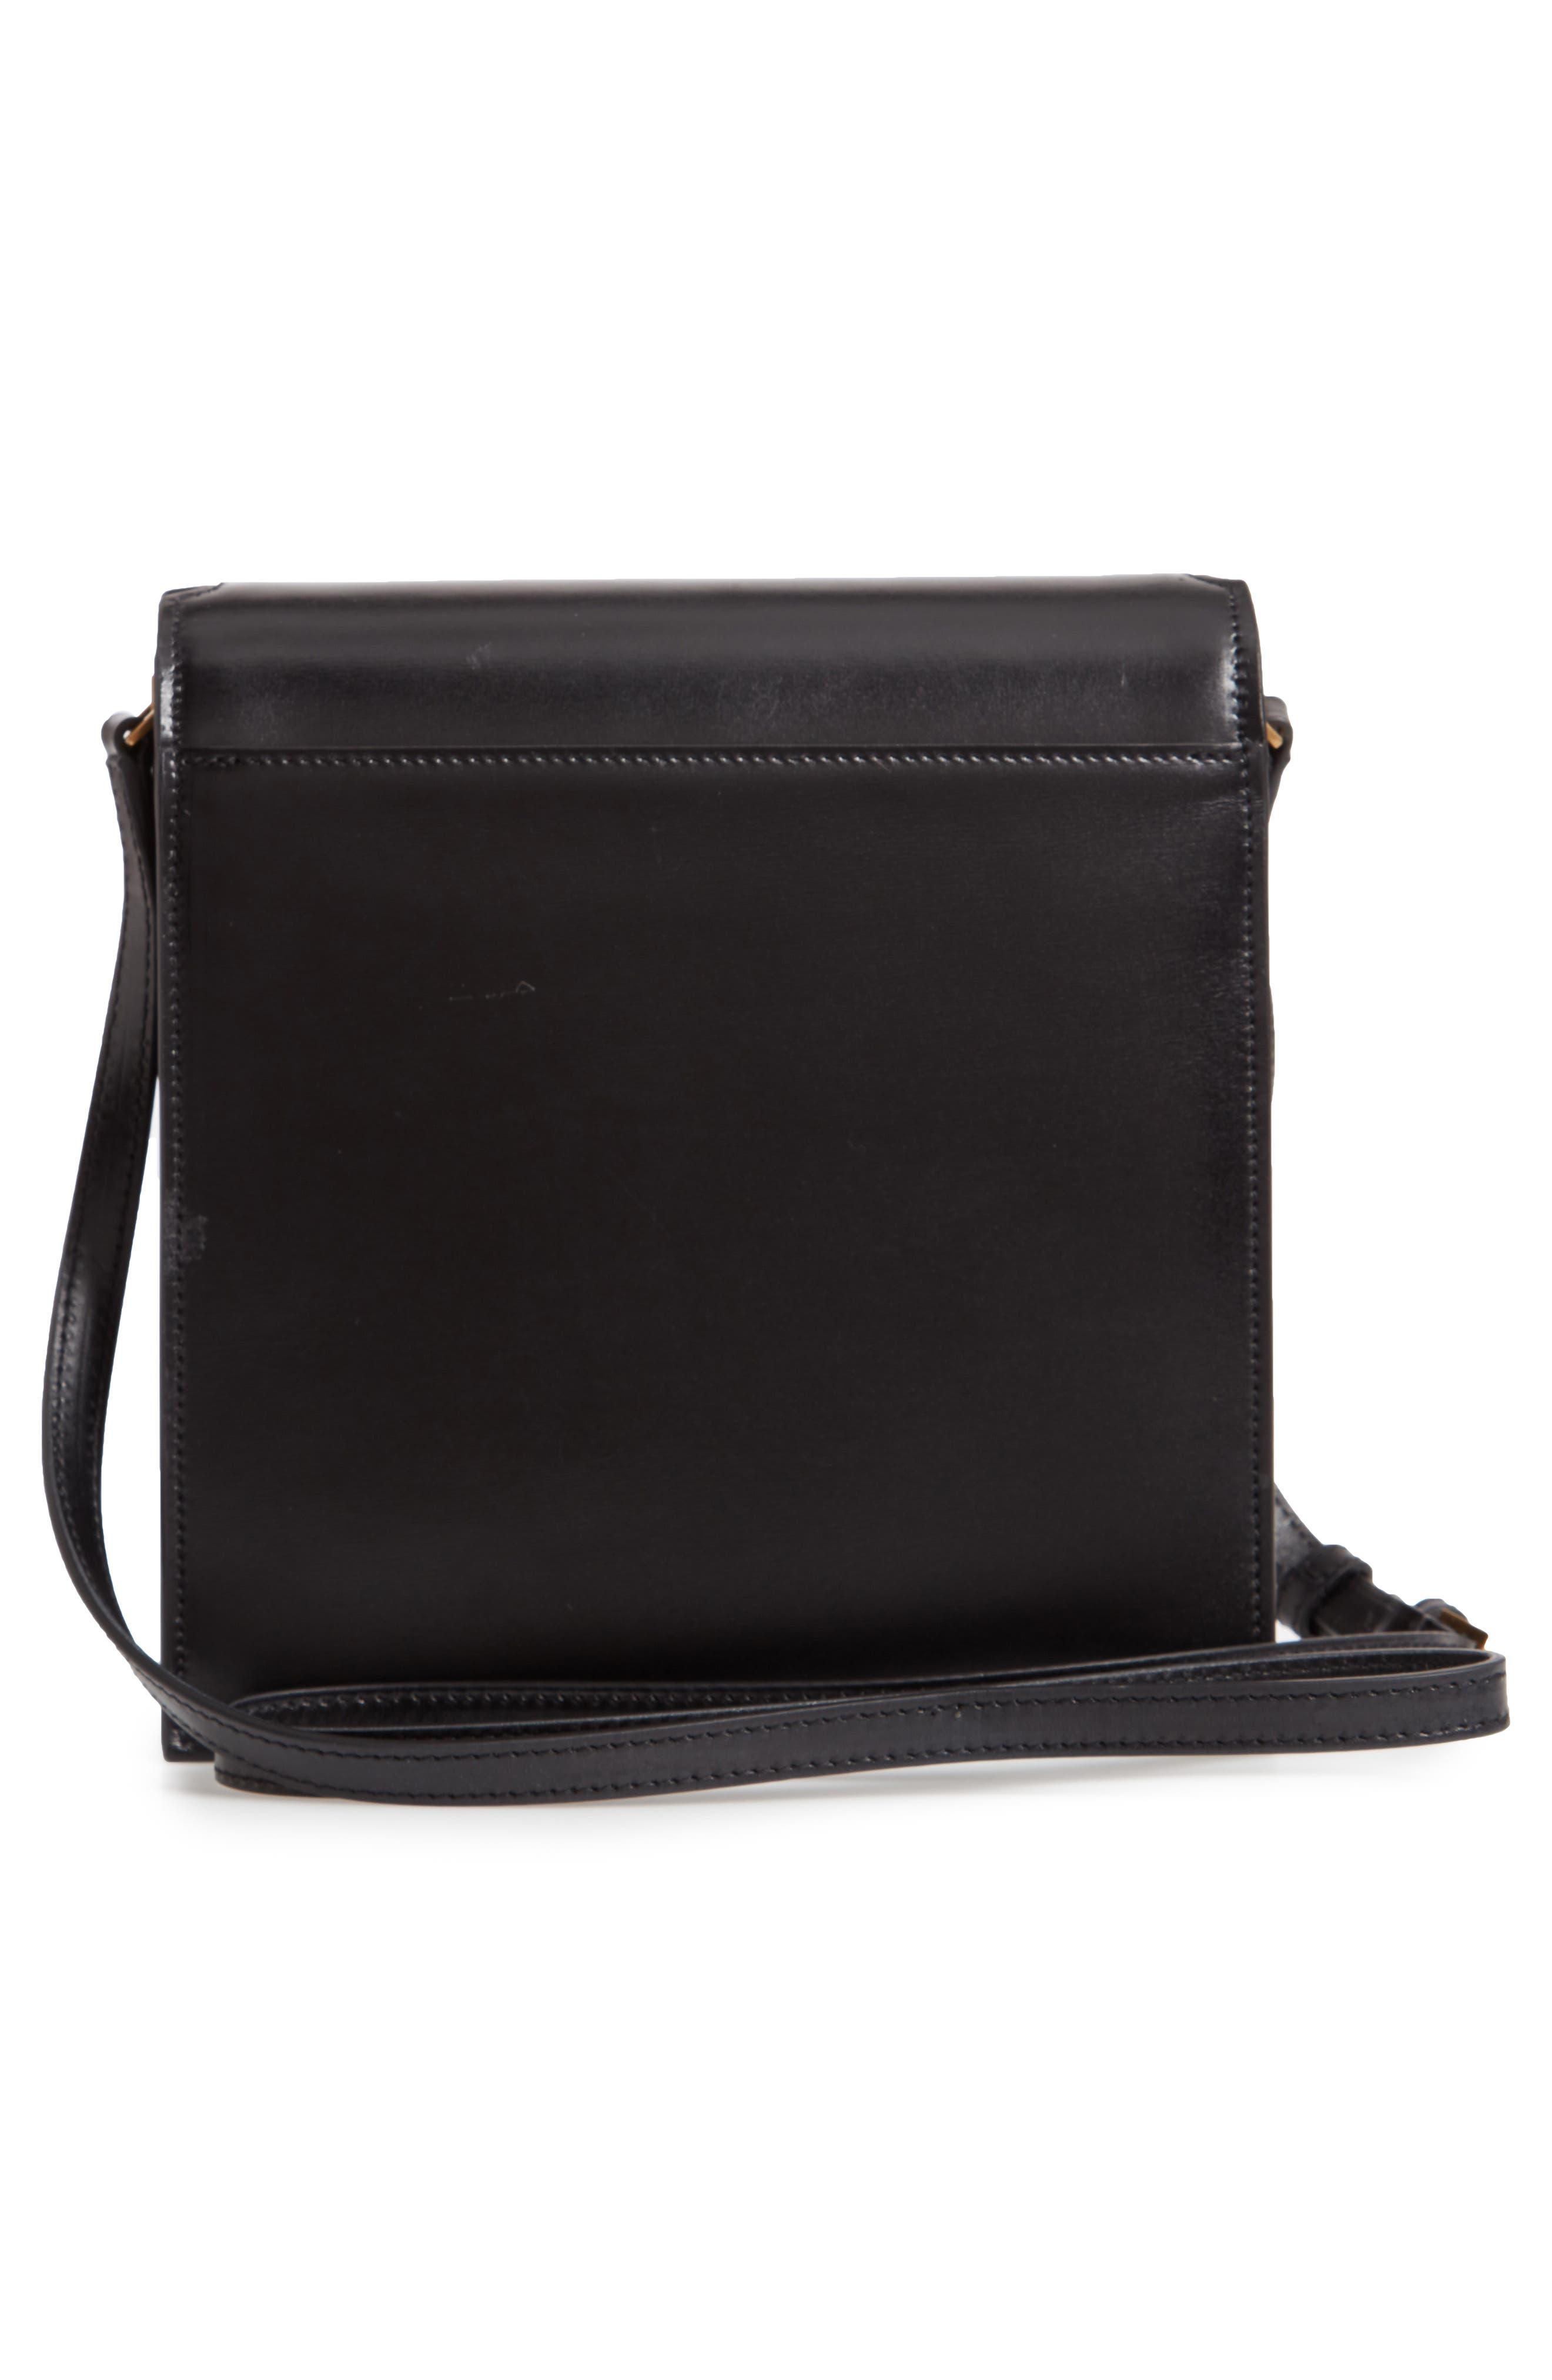 Sao Leather Shoulder Bag,                             Alternate thumbnail 3, color,                             NOIR